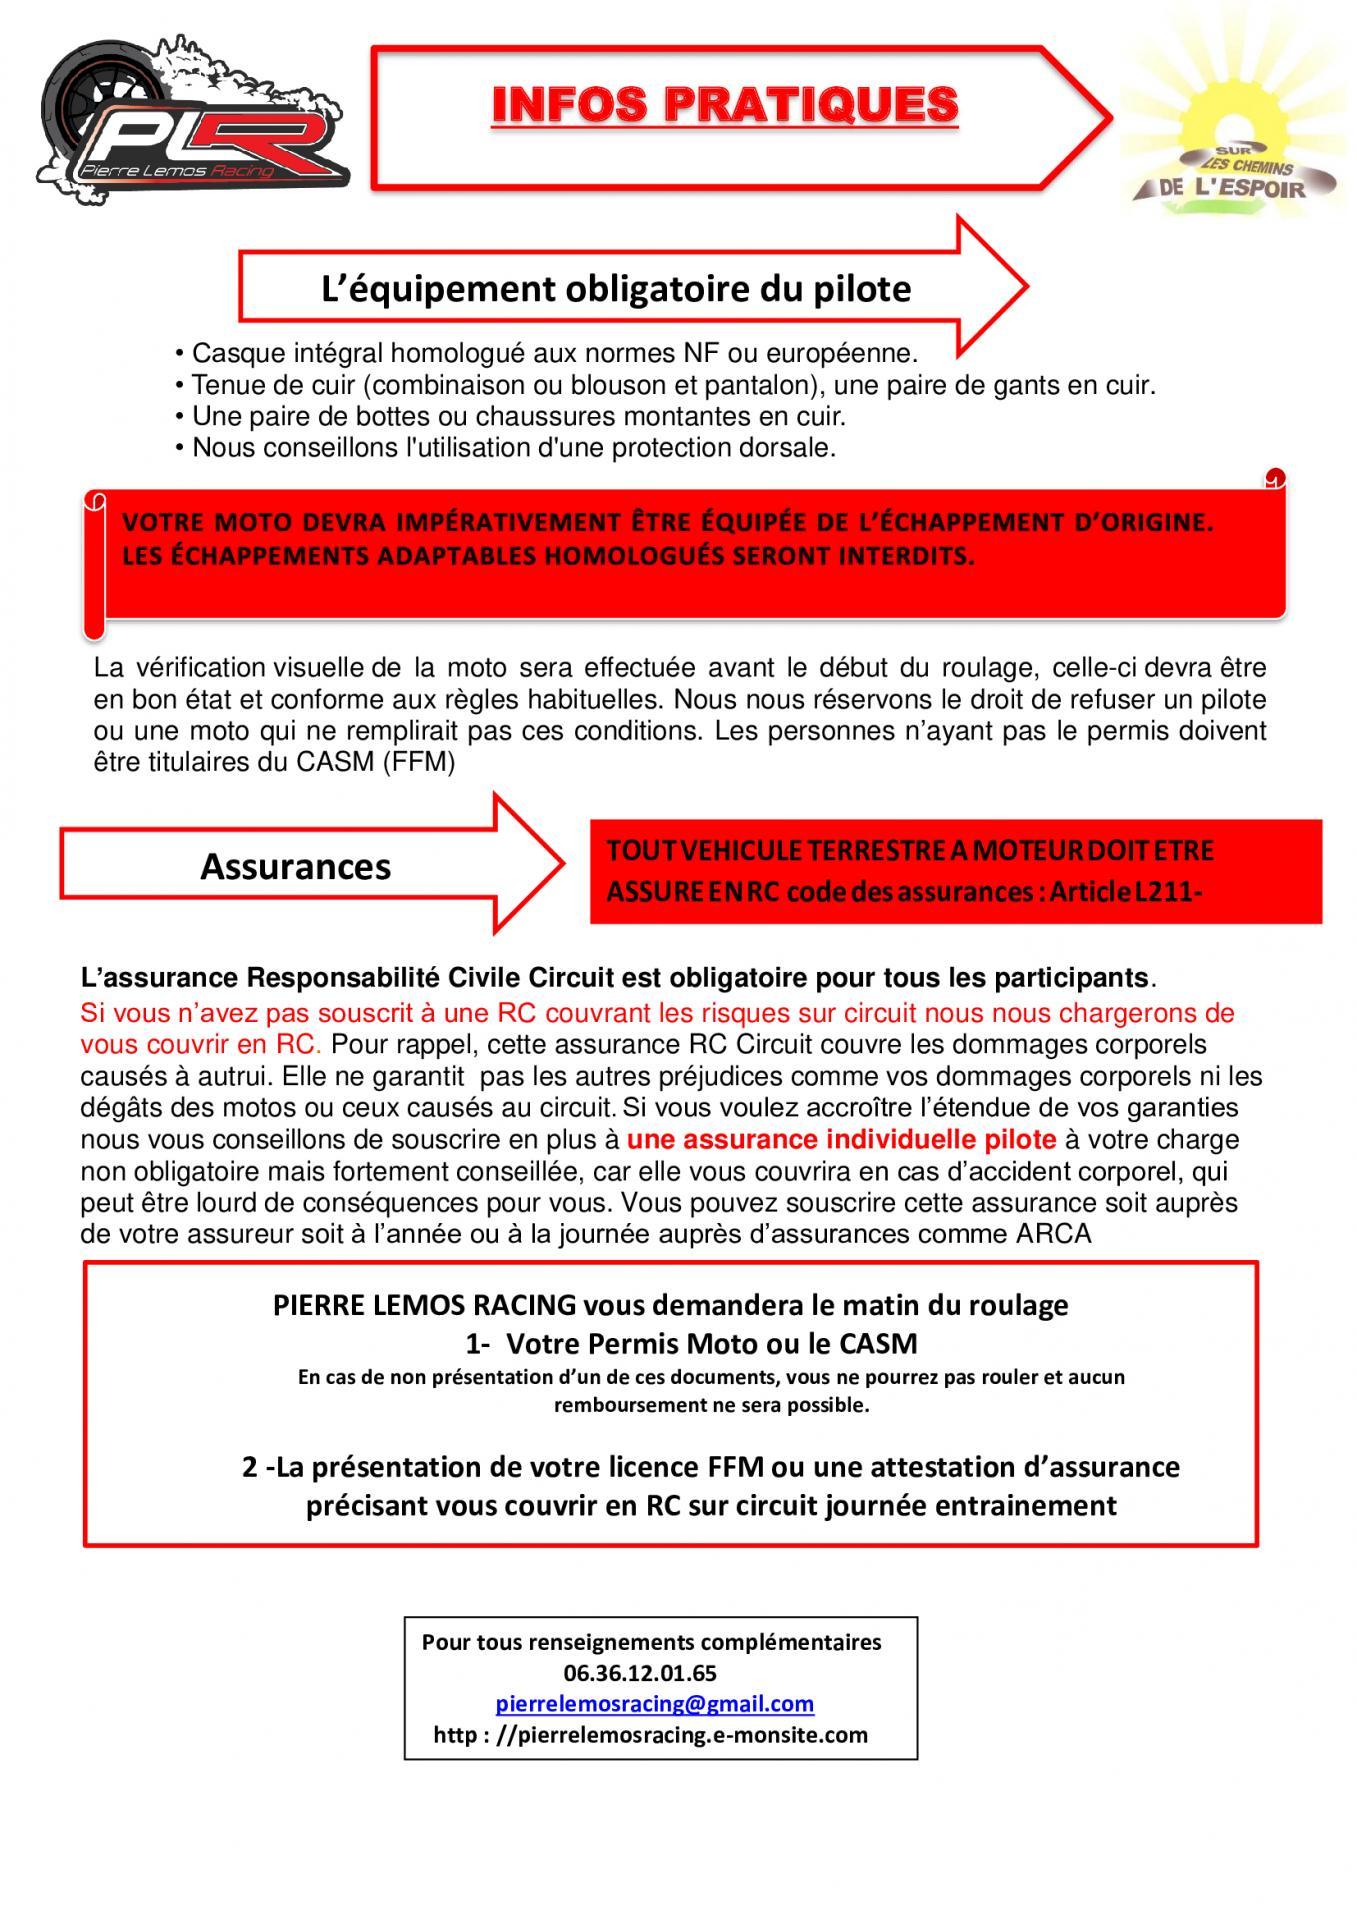 Infos pratiques line 2